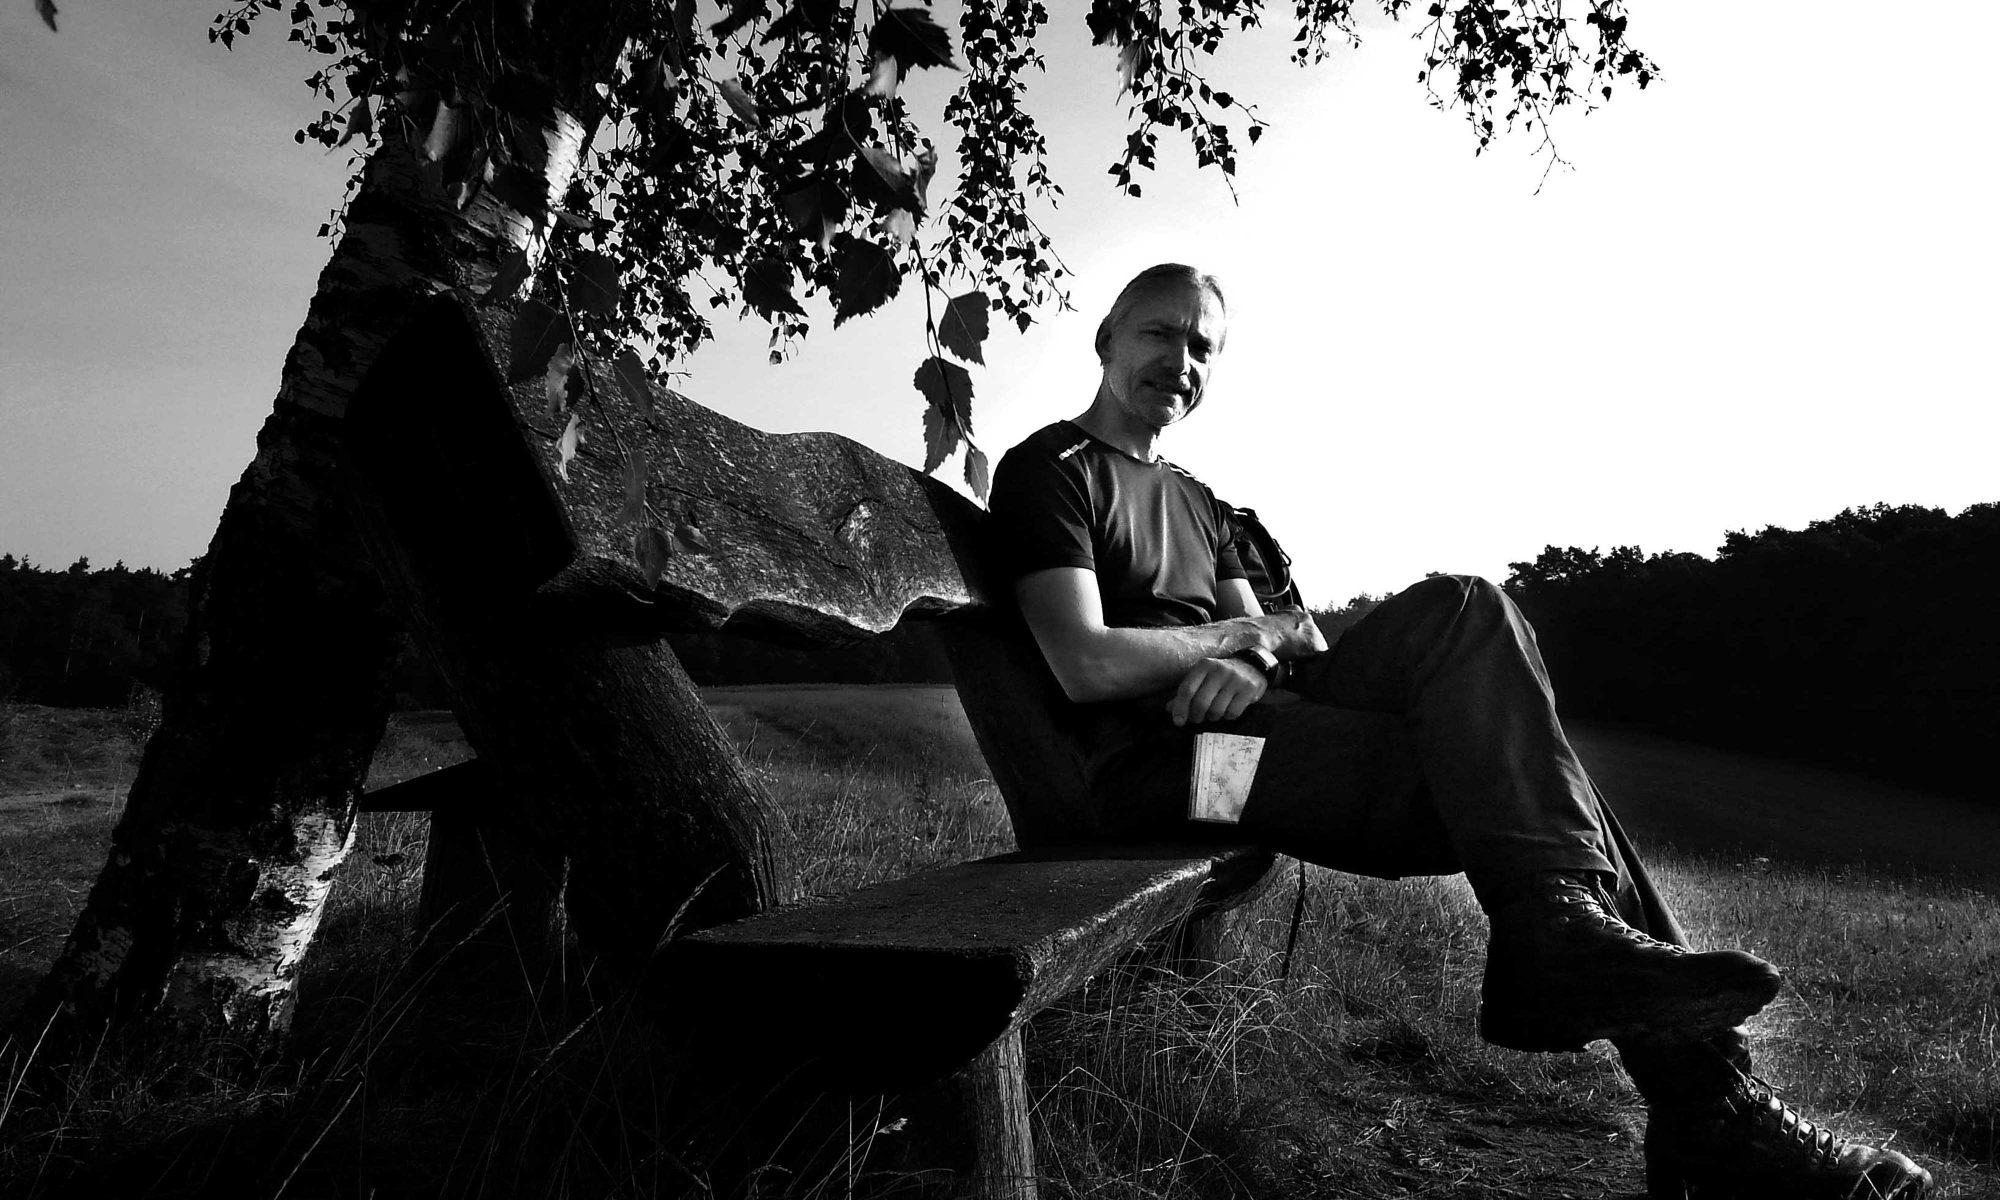 Marco Baré, Filmautor, Produzent und Kameramann